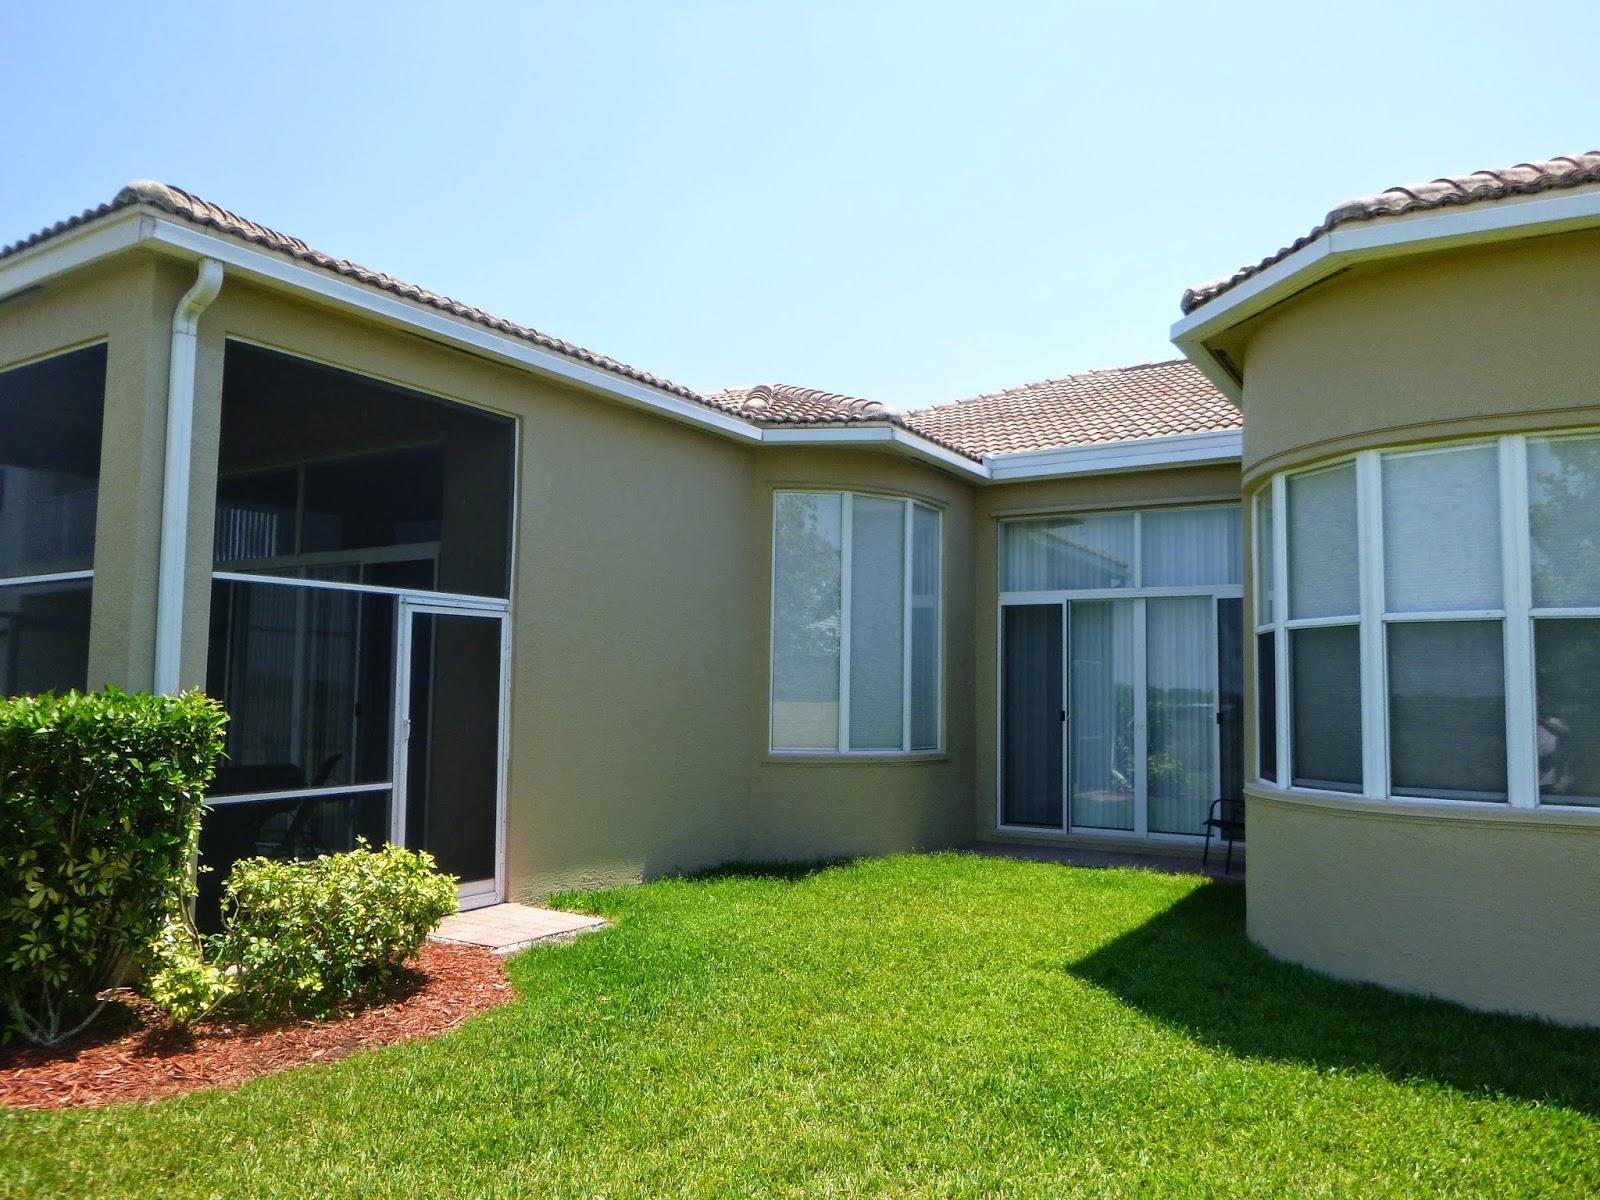 The Paint House Fort Pierce Florida